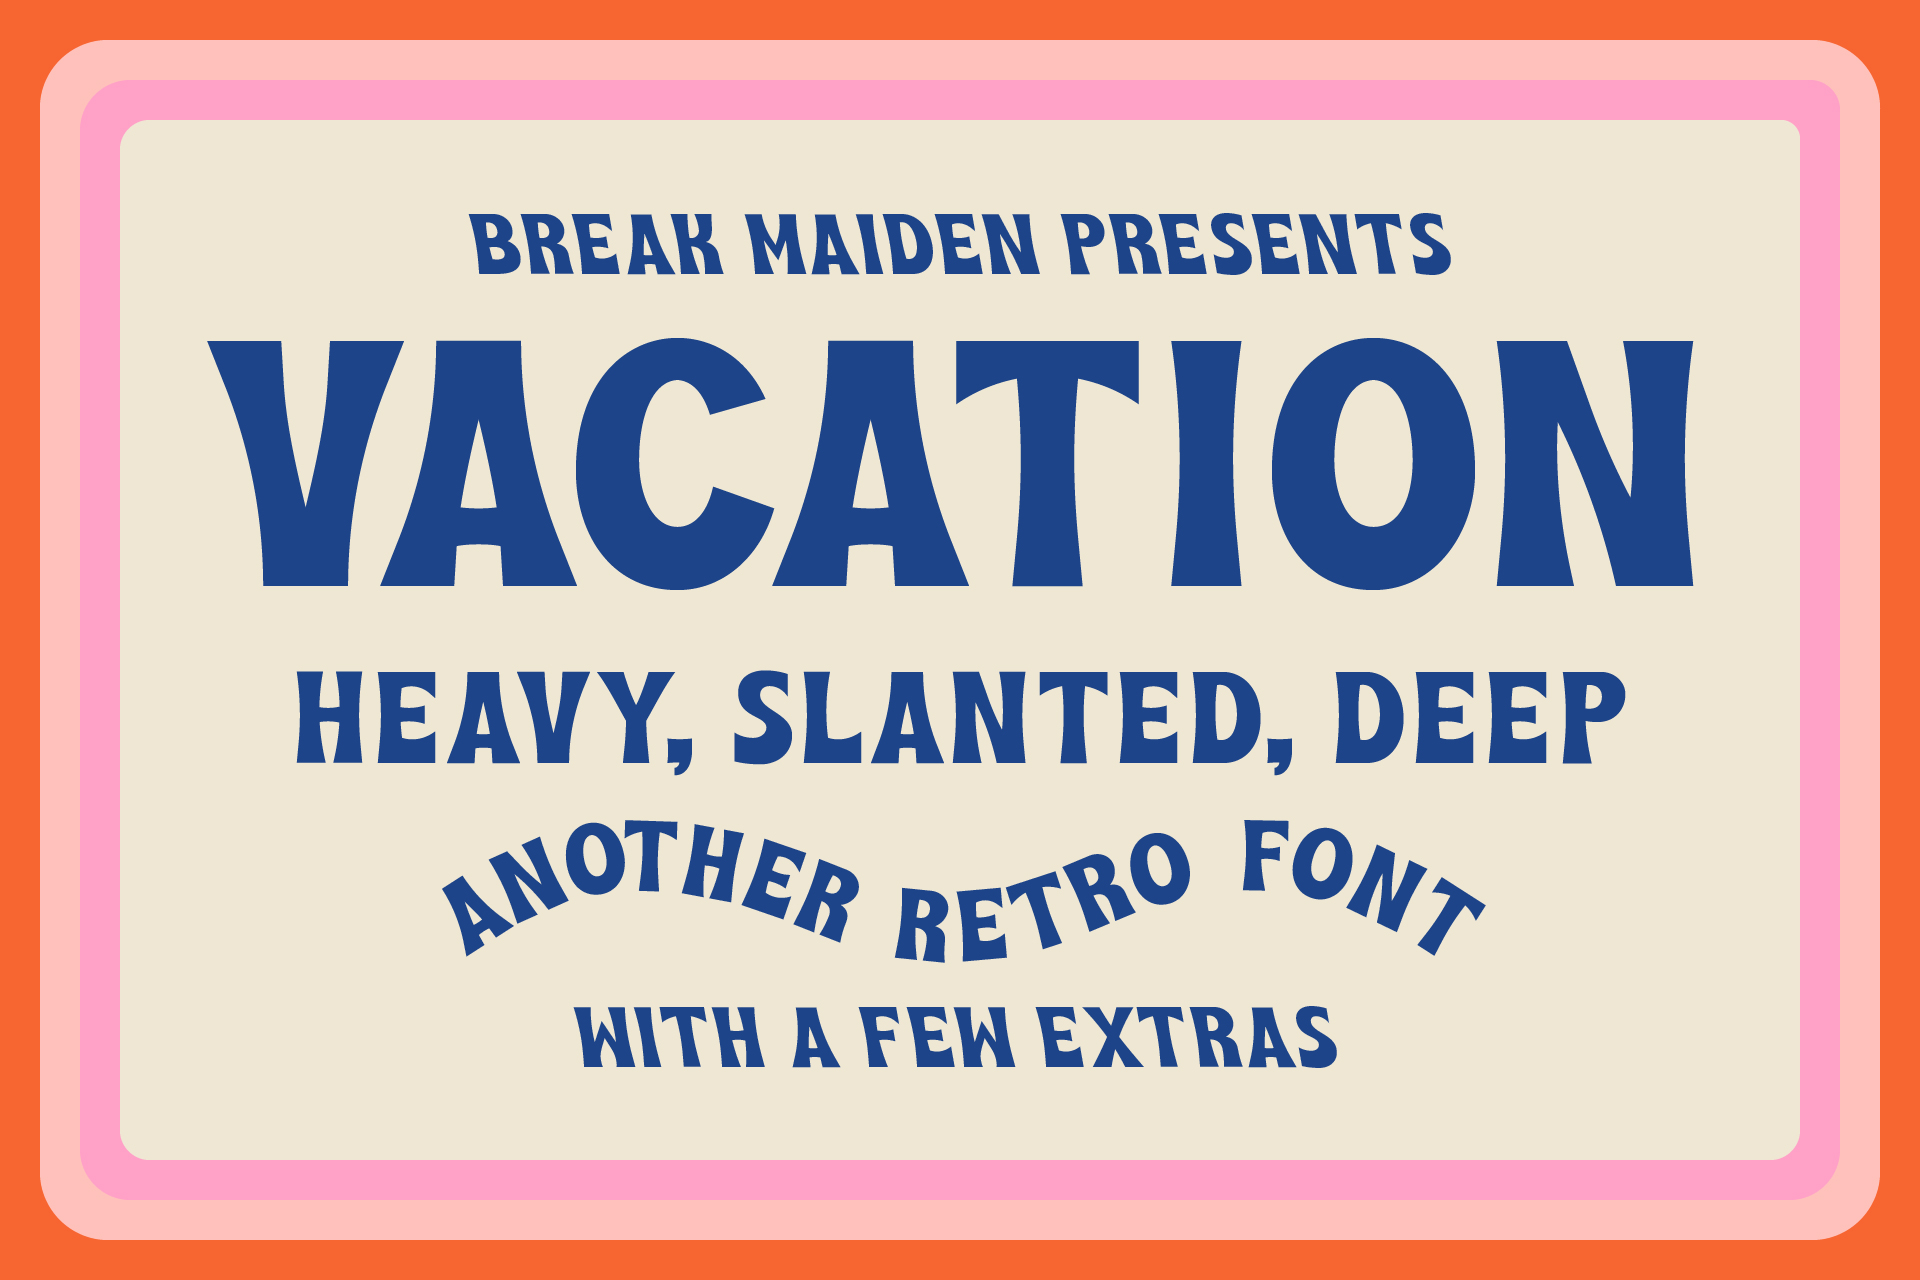 Vacation_Display-01 (1).jpg